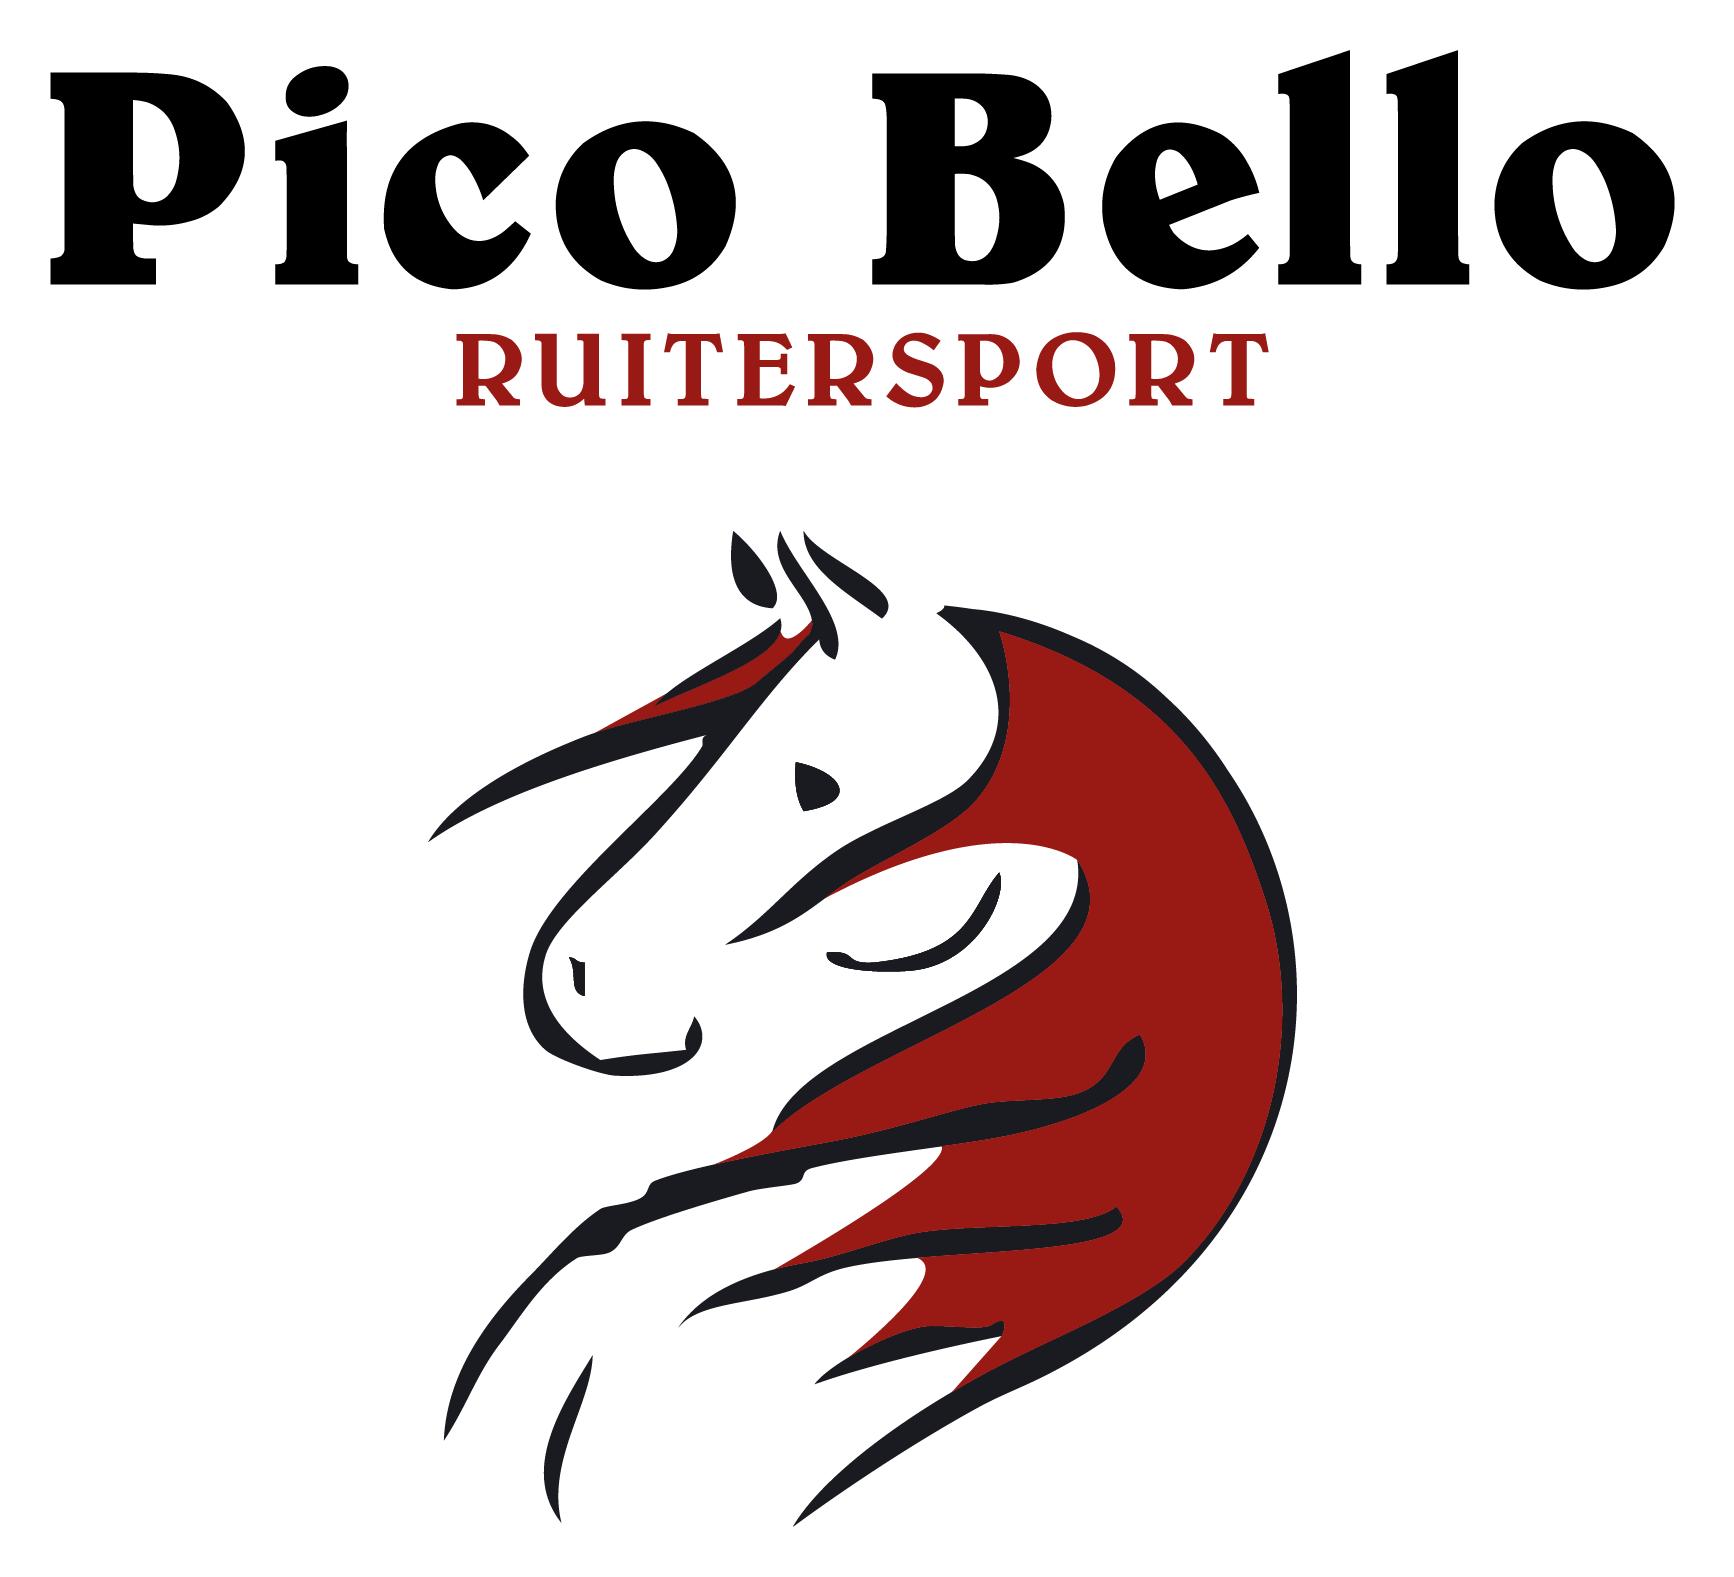 Pico Bello Ruitersport in Snellegem door Lieve Dereu